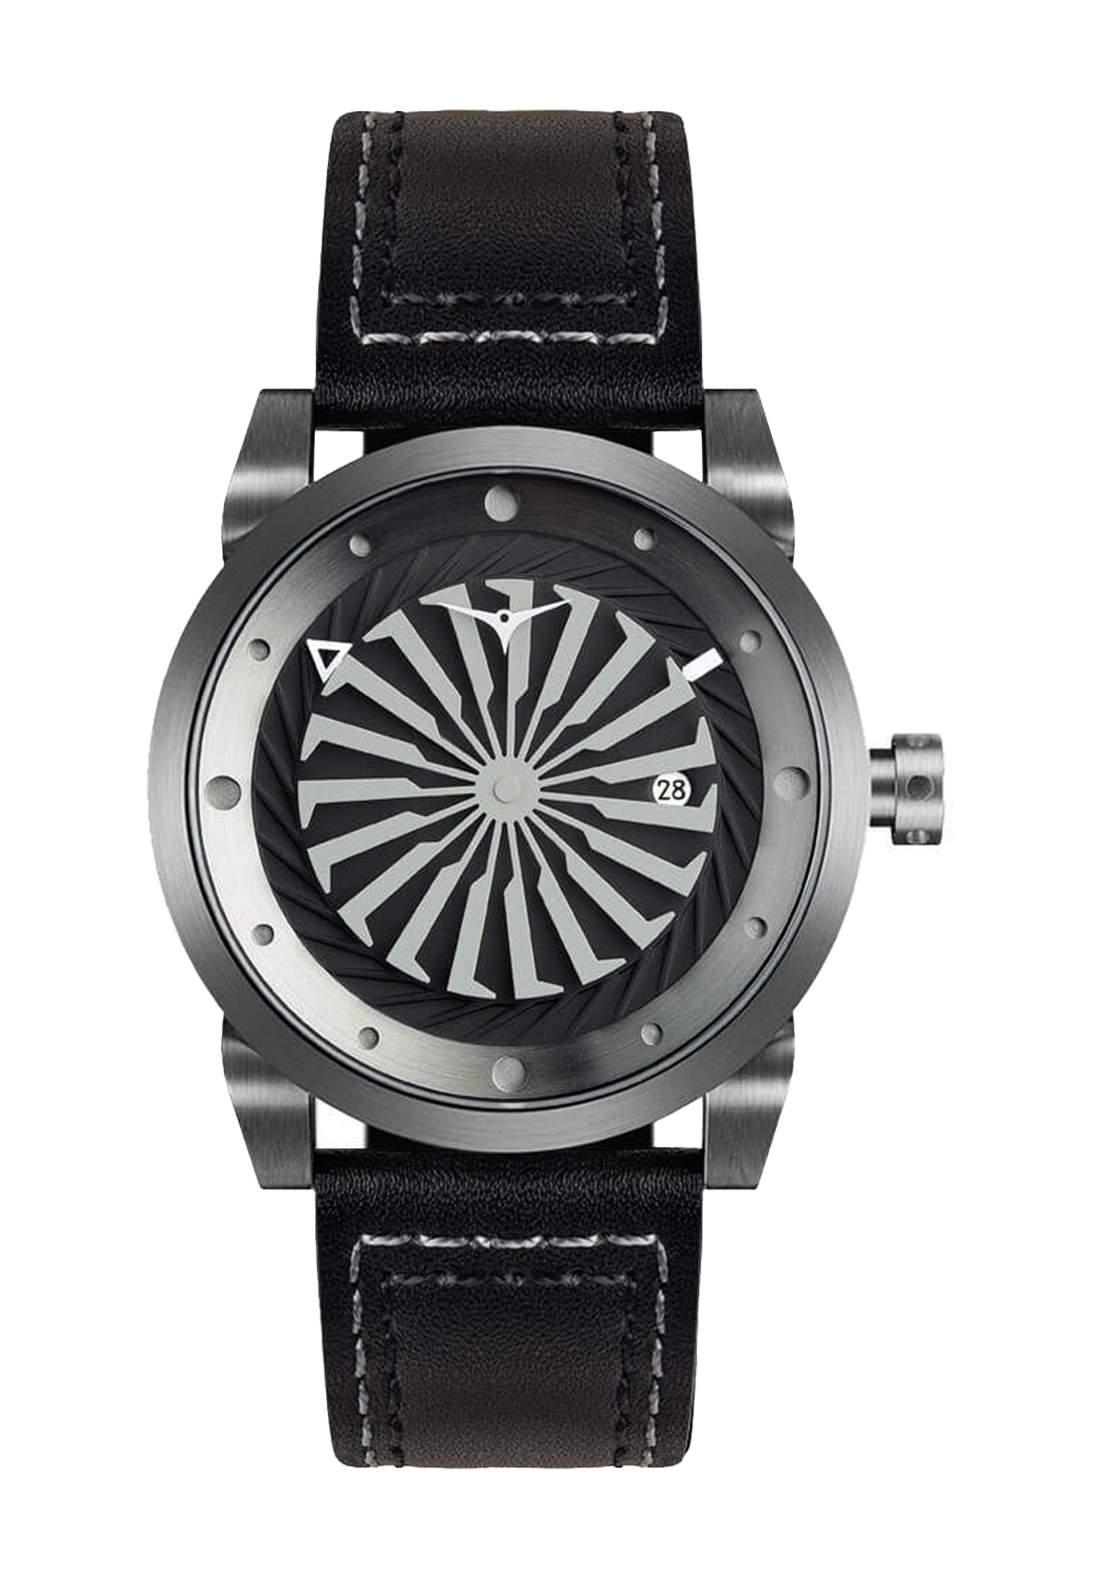 Zinvo Rival Gunmetal Watch For Men - Black  ساعة رجالي